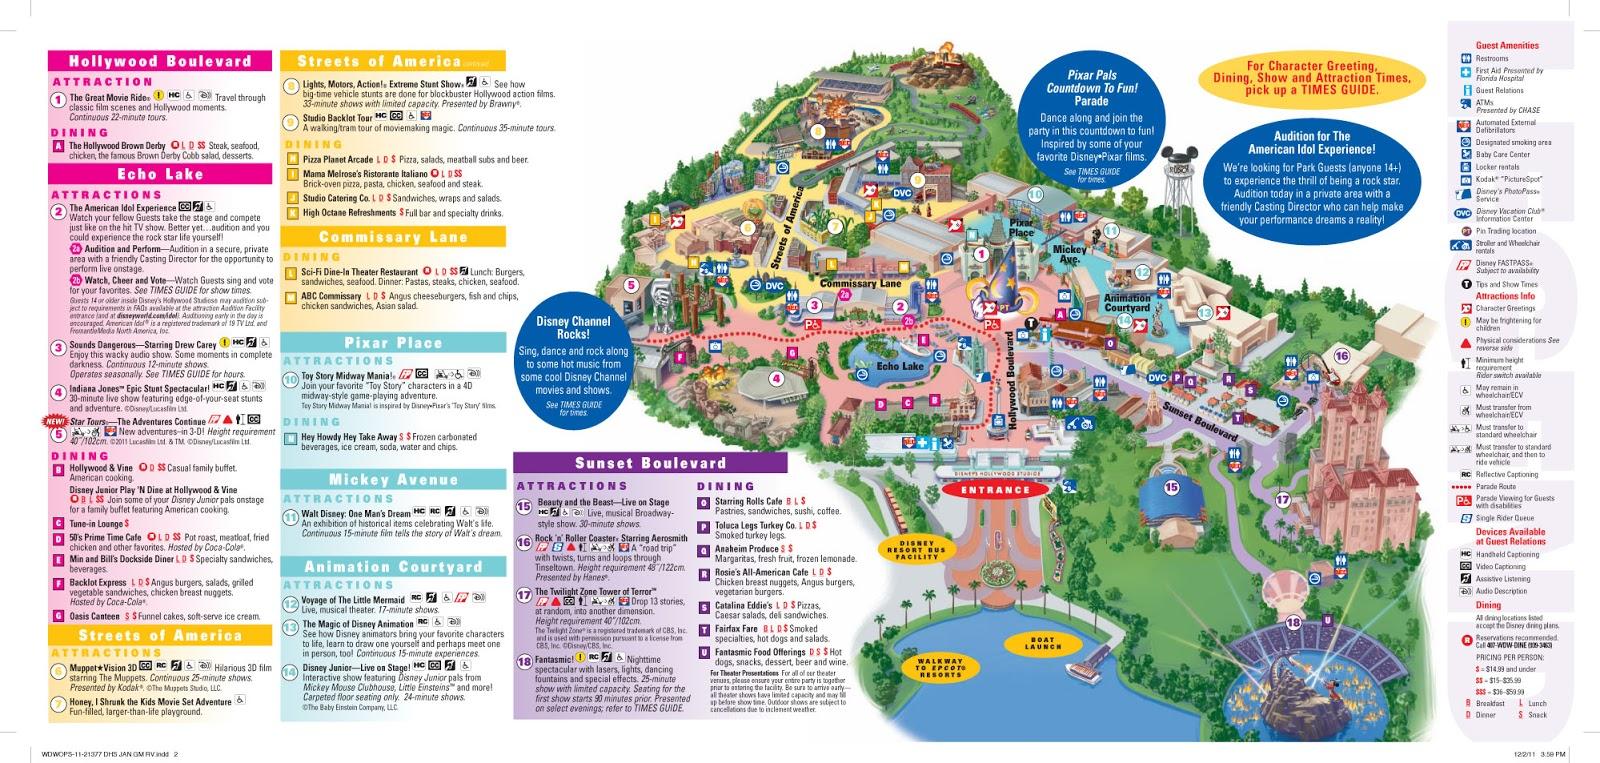 Parkscope: The New Walt Disney World Guide Maps